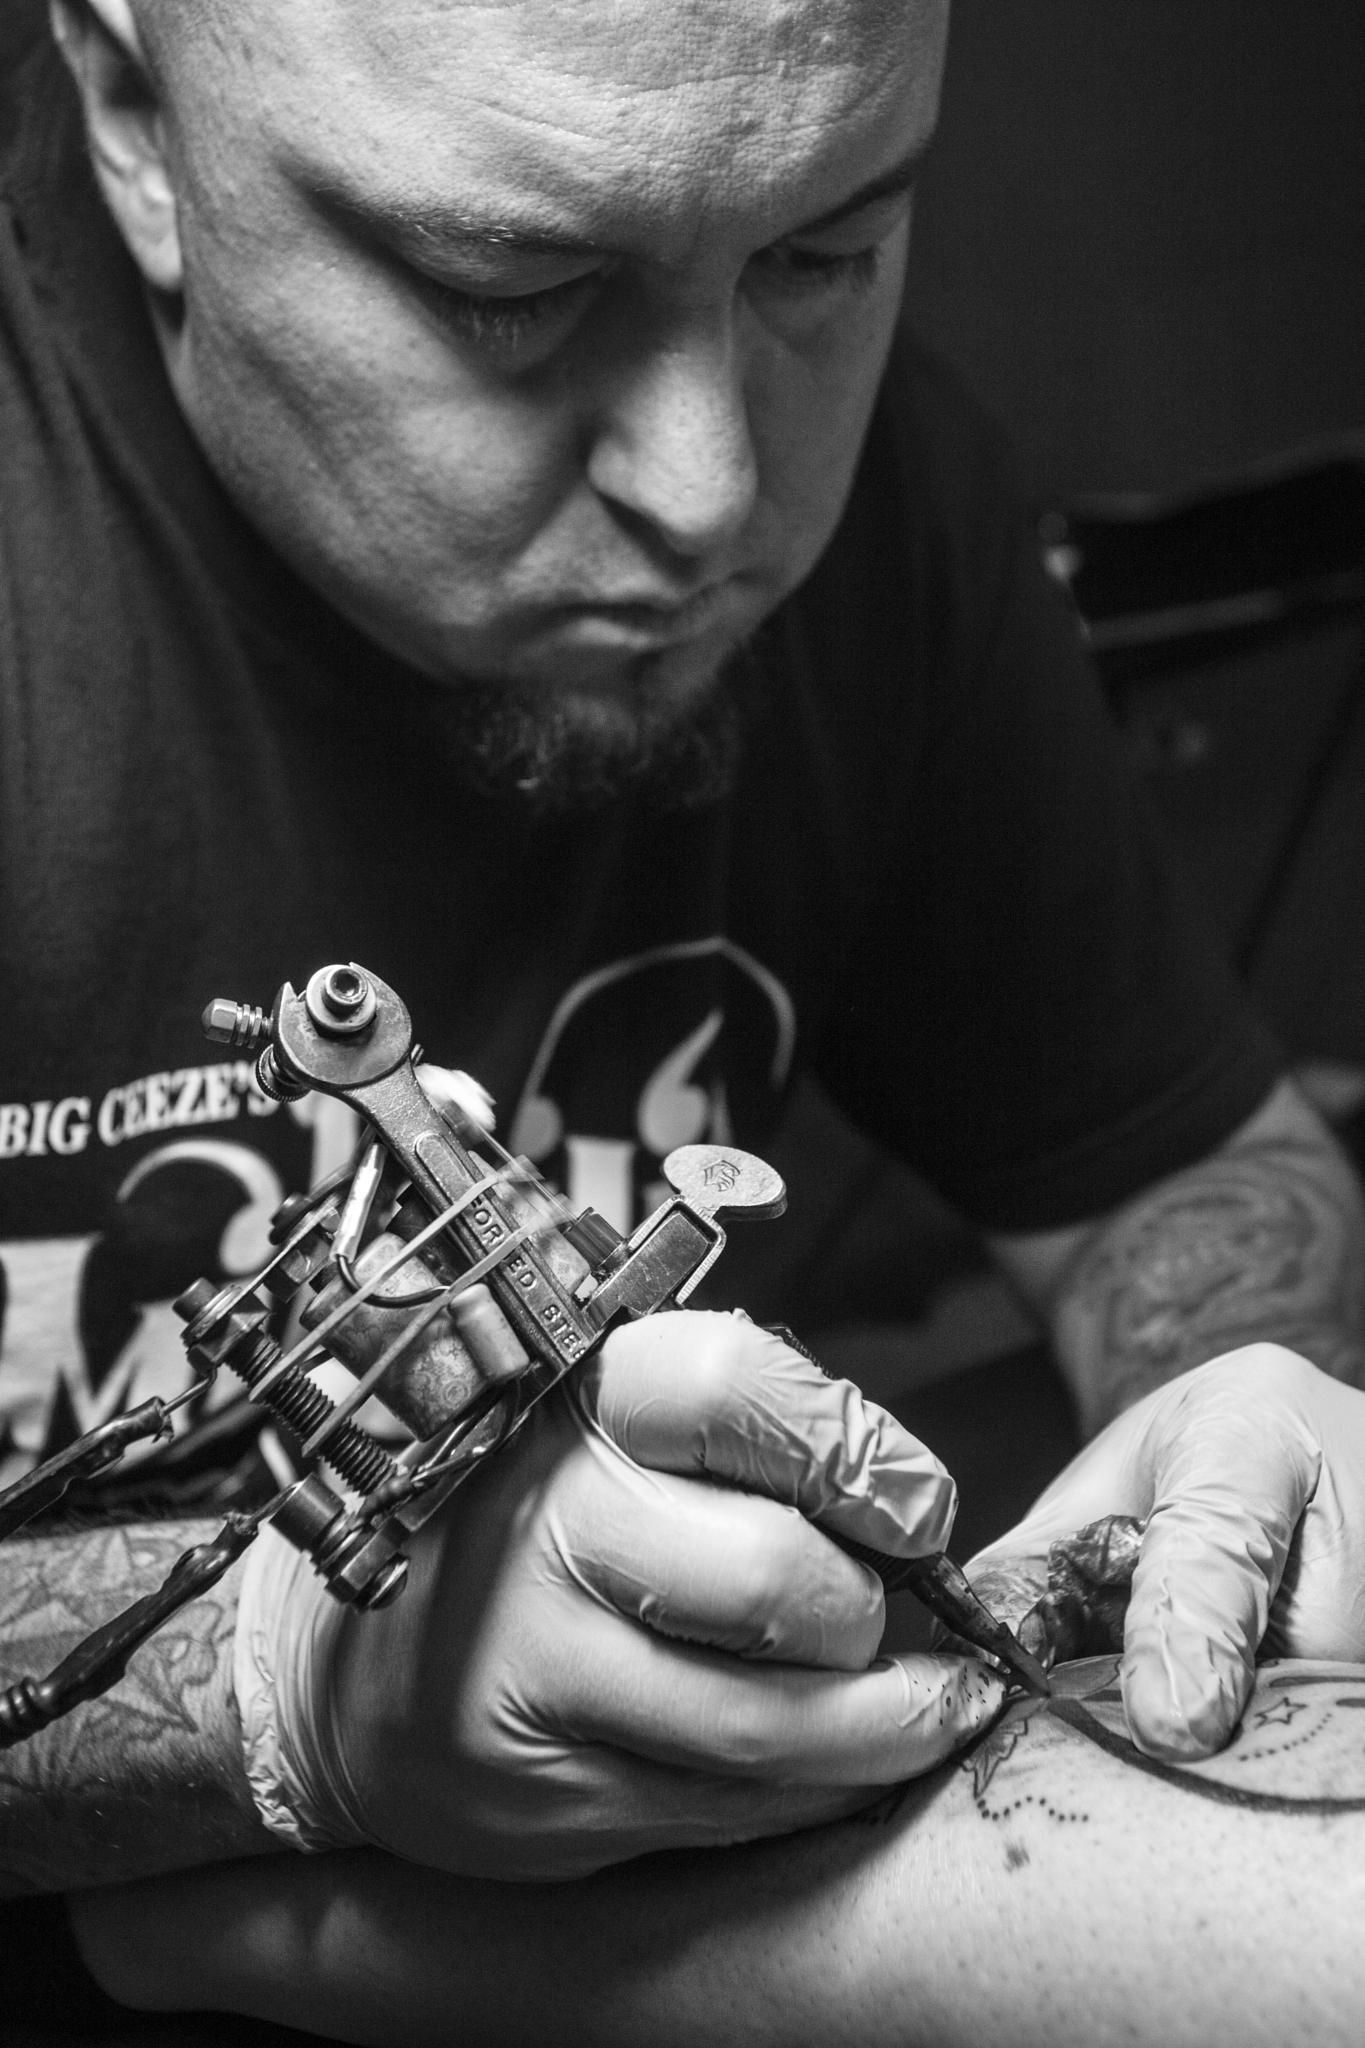 The Artist at Work by Matthew David Kuiper